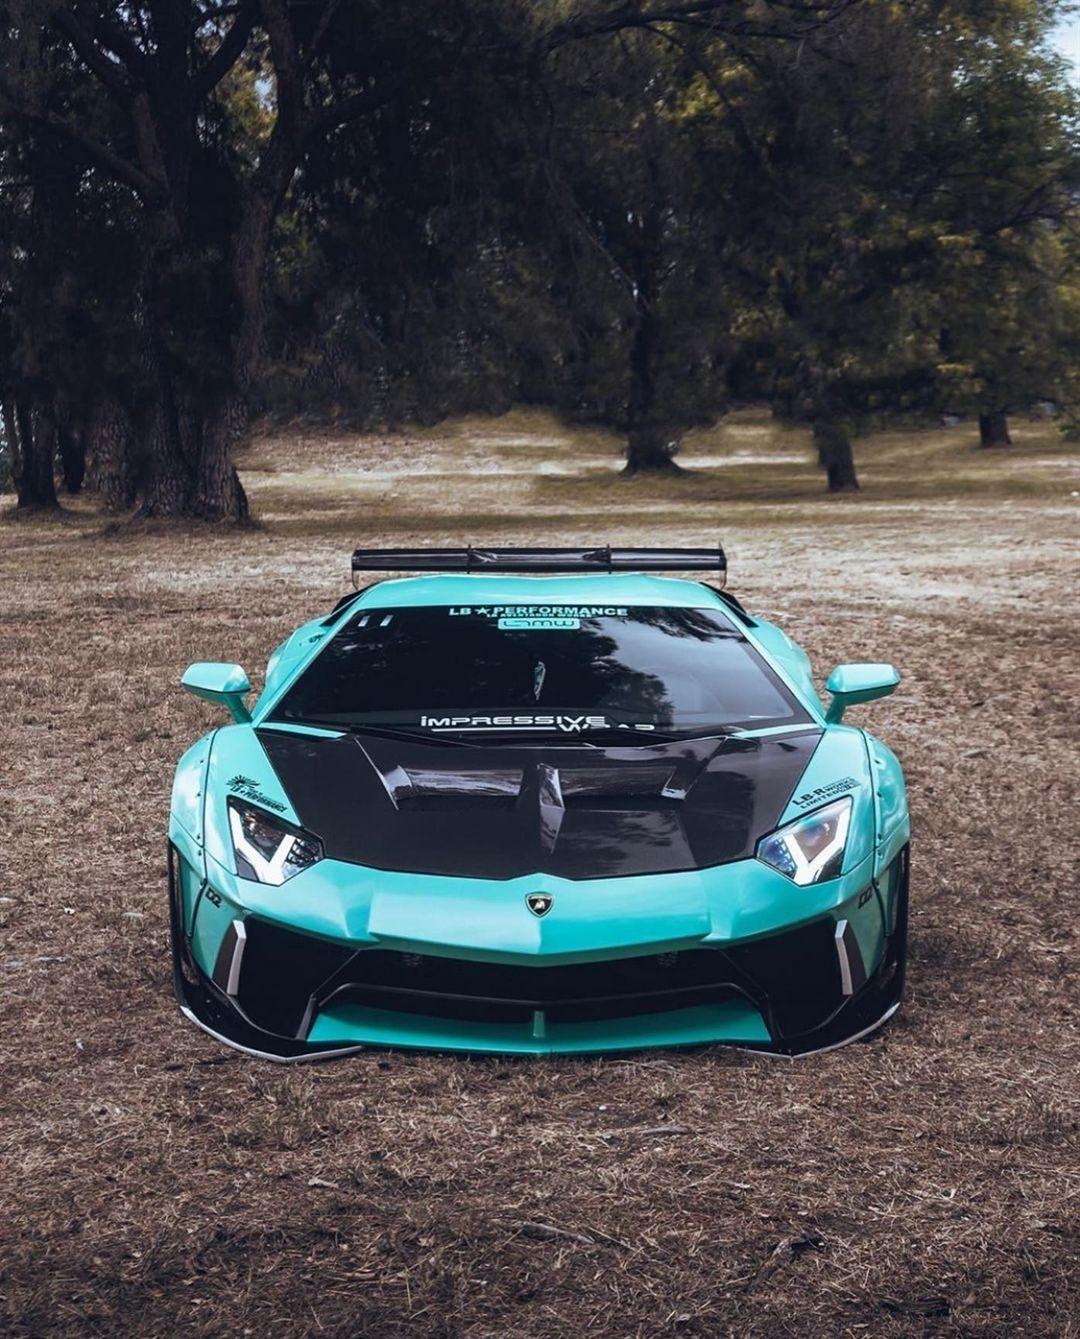 Supercar Automotive Lifestyle Cars Supercars Racecar Musclecars Musclecar Sportscars Sportcars For M Super Cars Lamborghini Cars Lamborghini Aventador